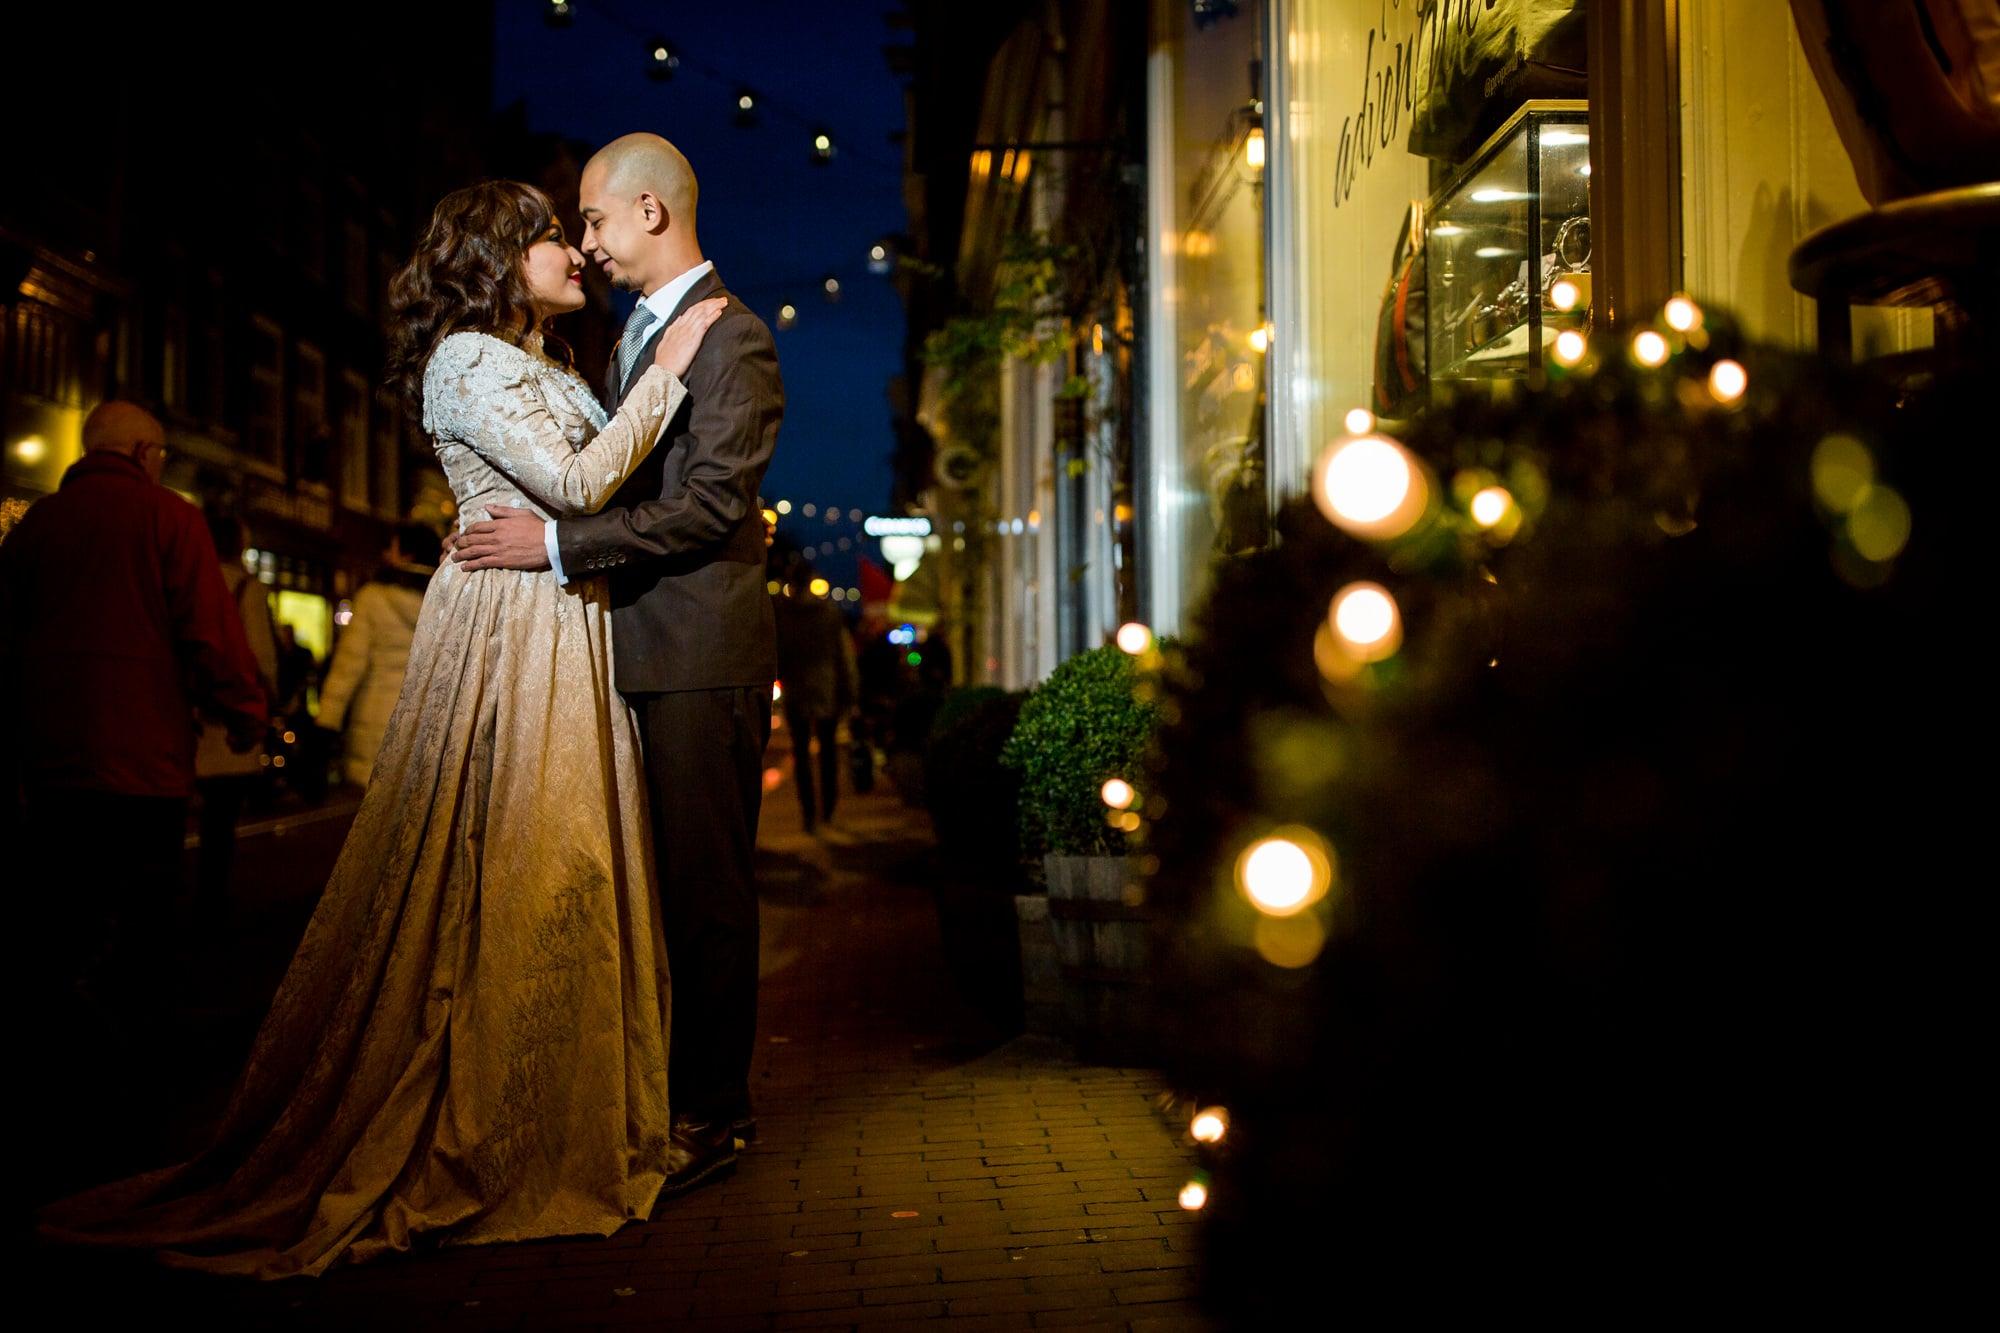 After Wedding Photoshoot Amsterdam - 03.jpg